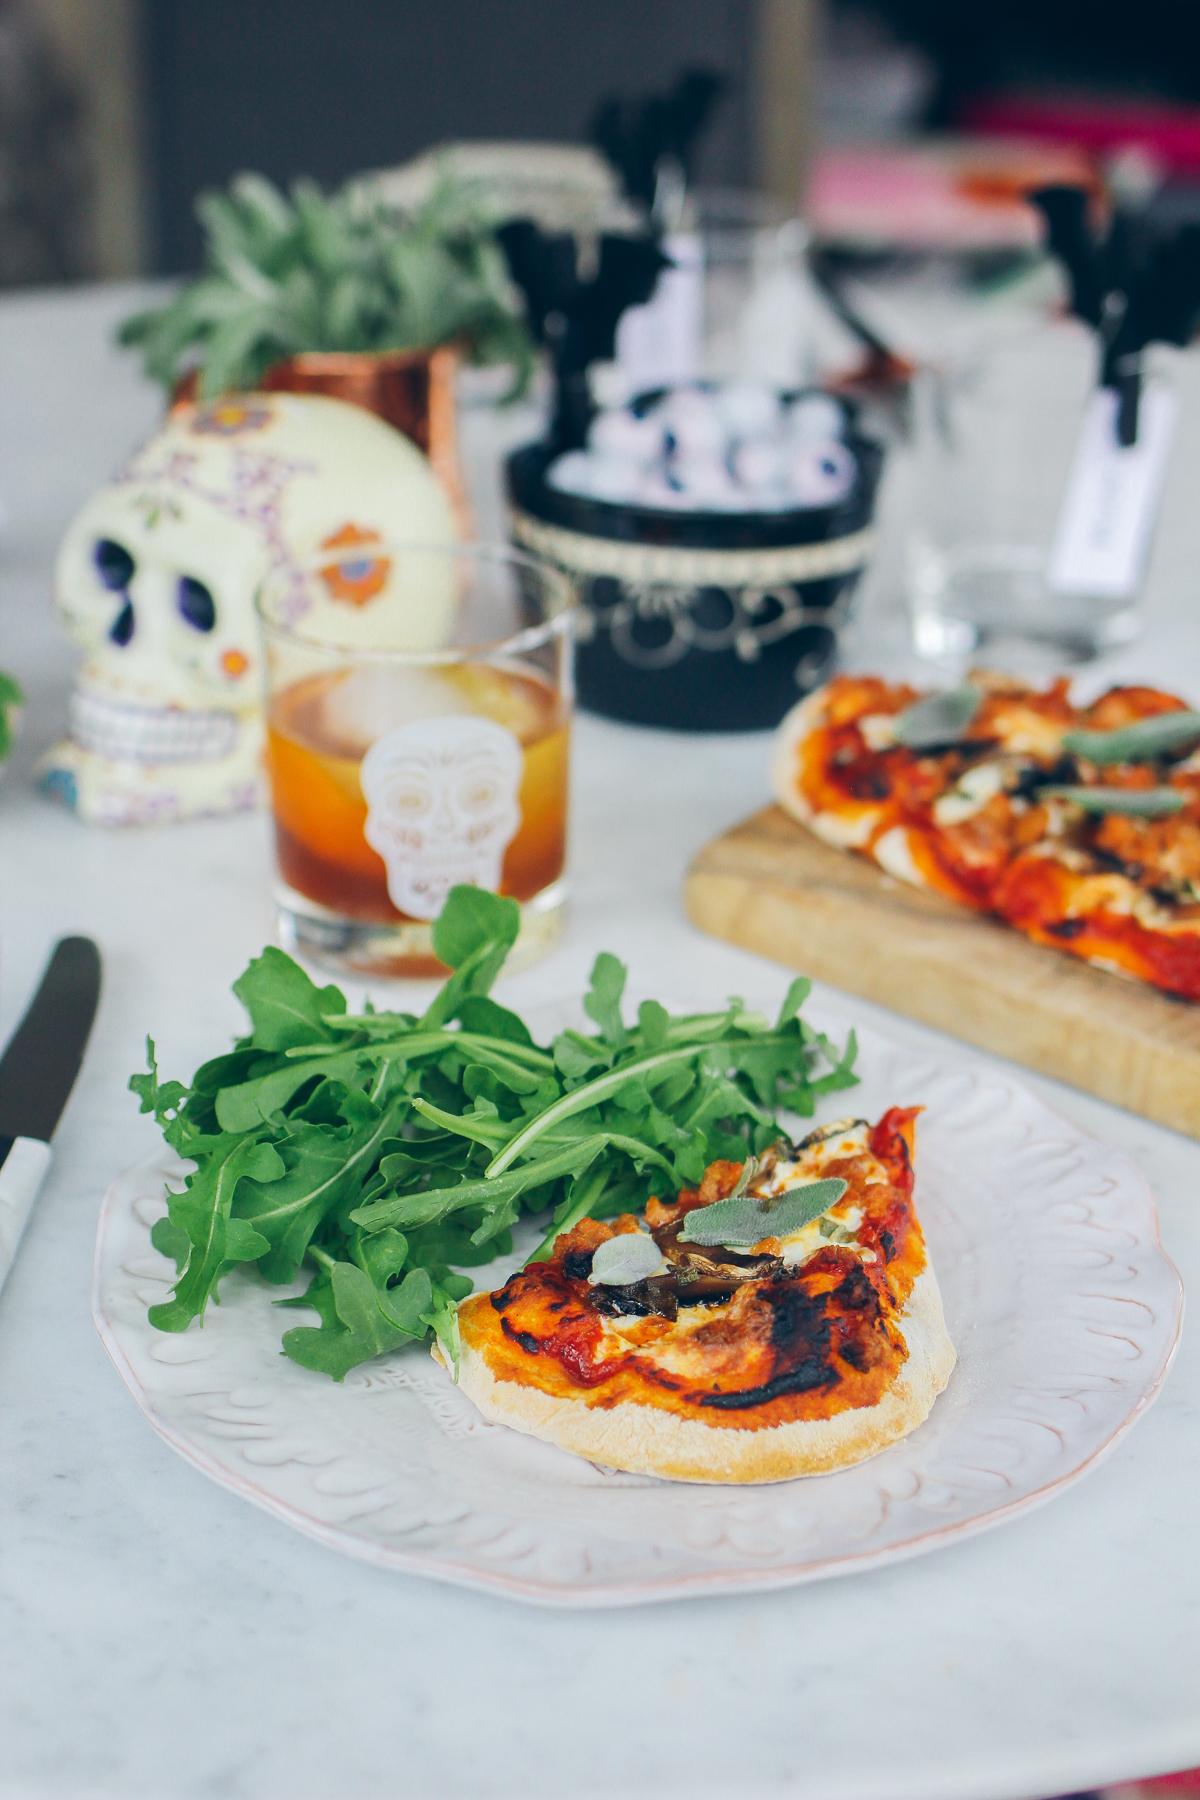 simple dinner, homemade pizza and arugula salad —via @TheFoxandShe